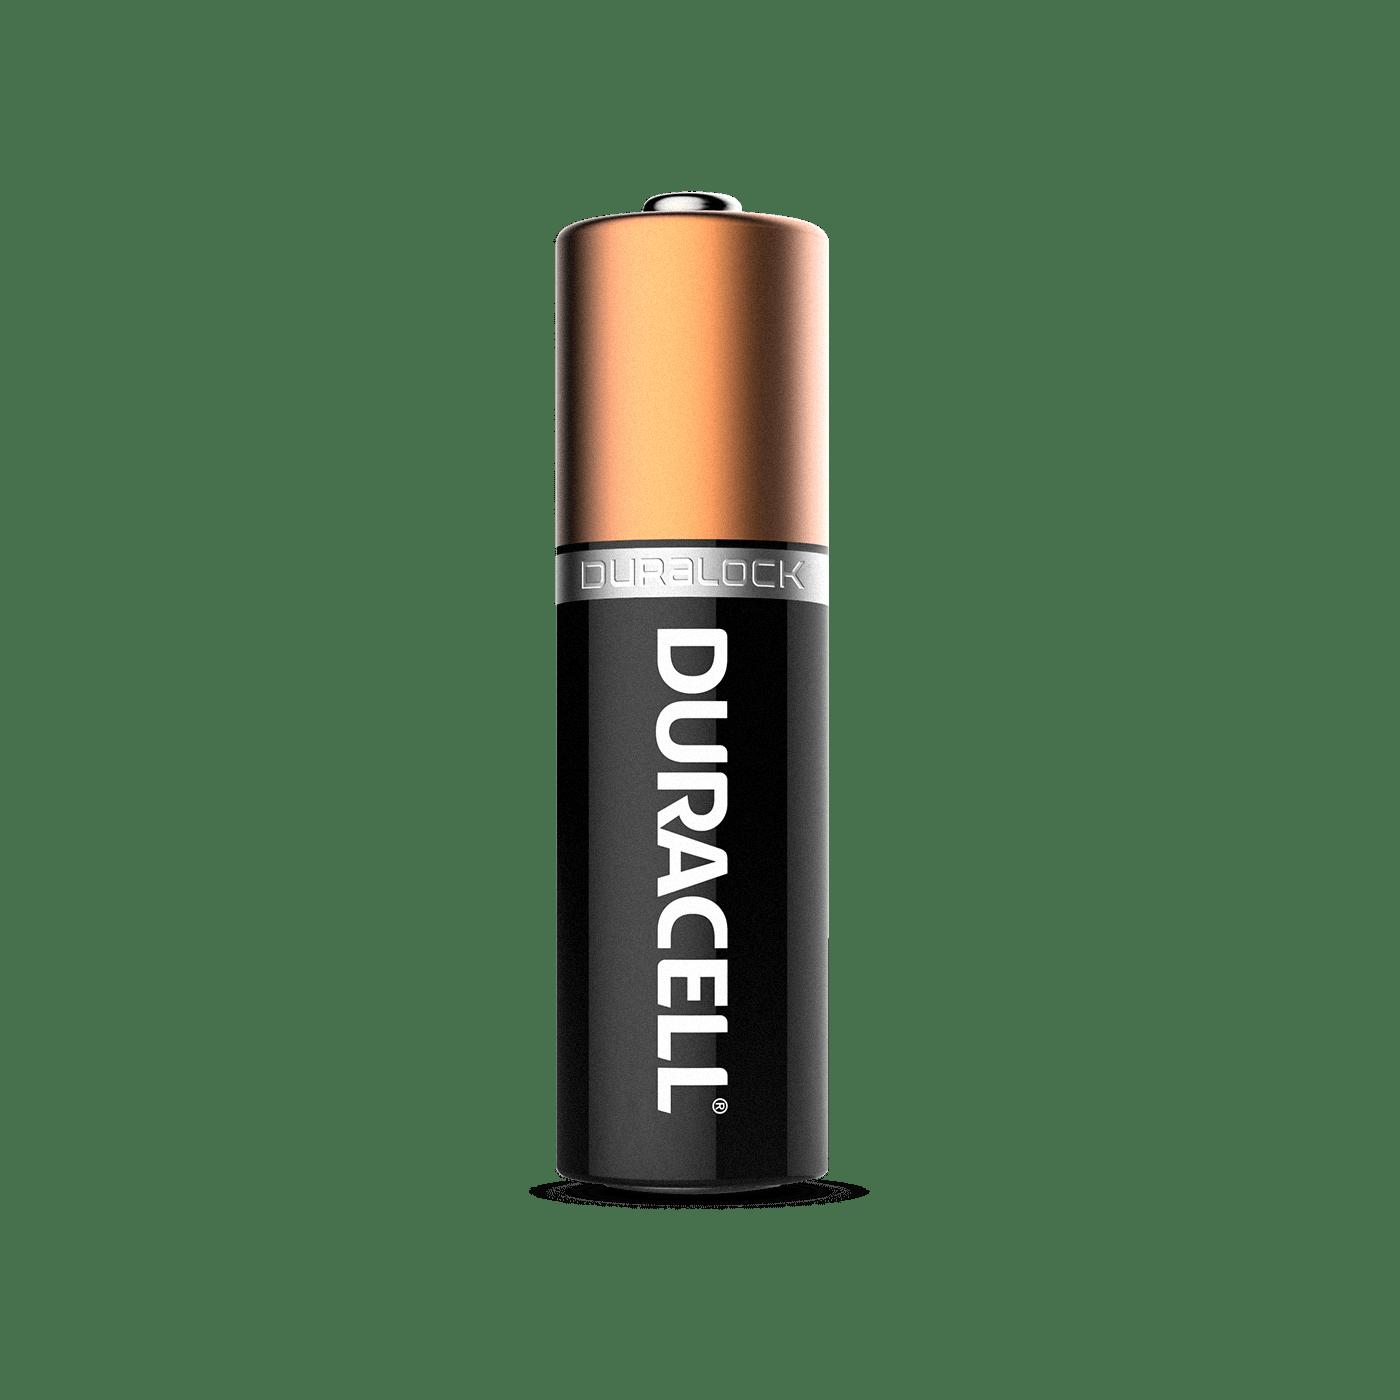 Battery Transparent Image